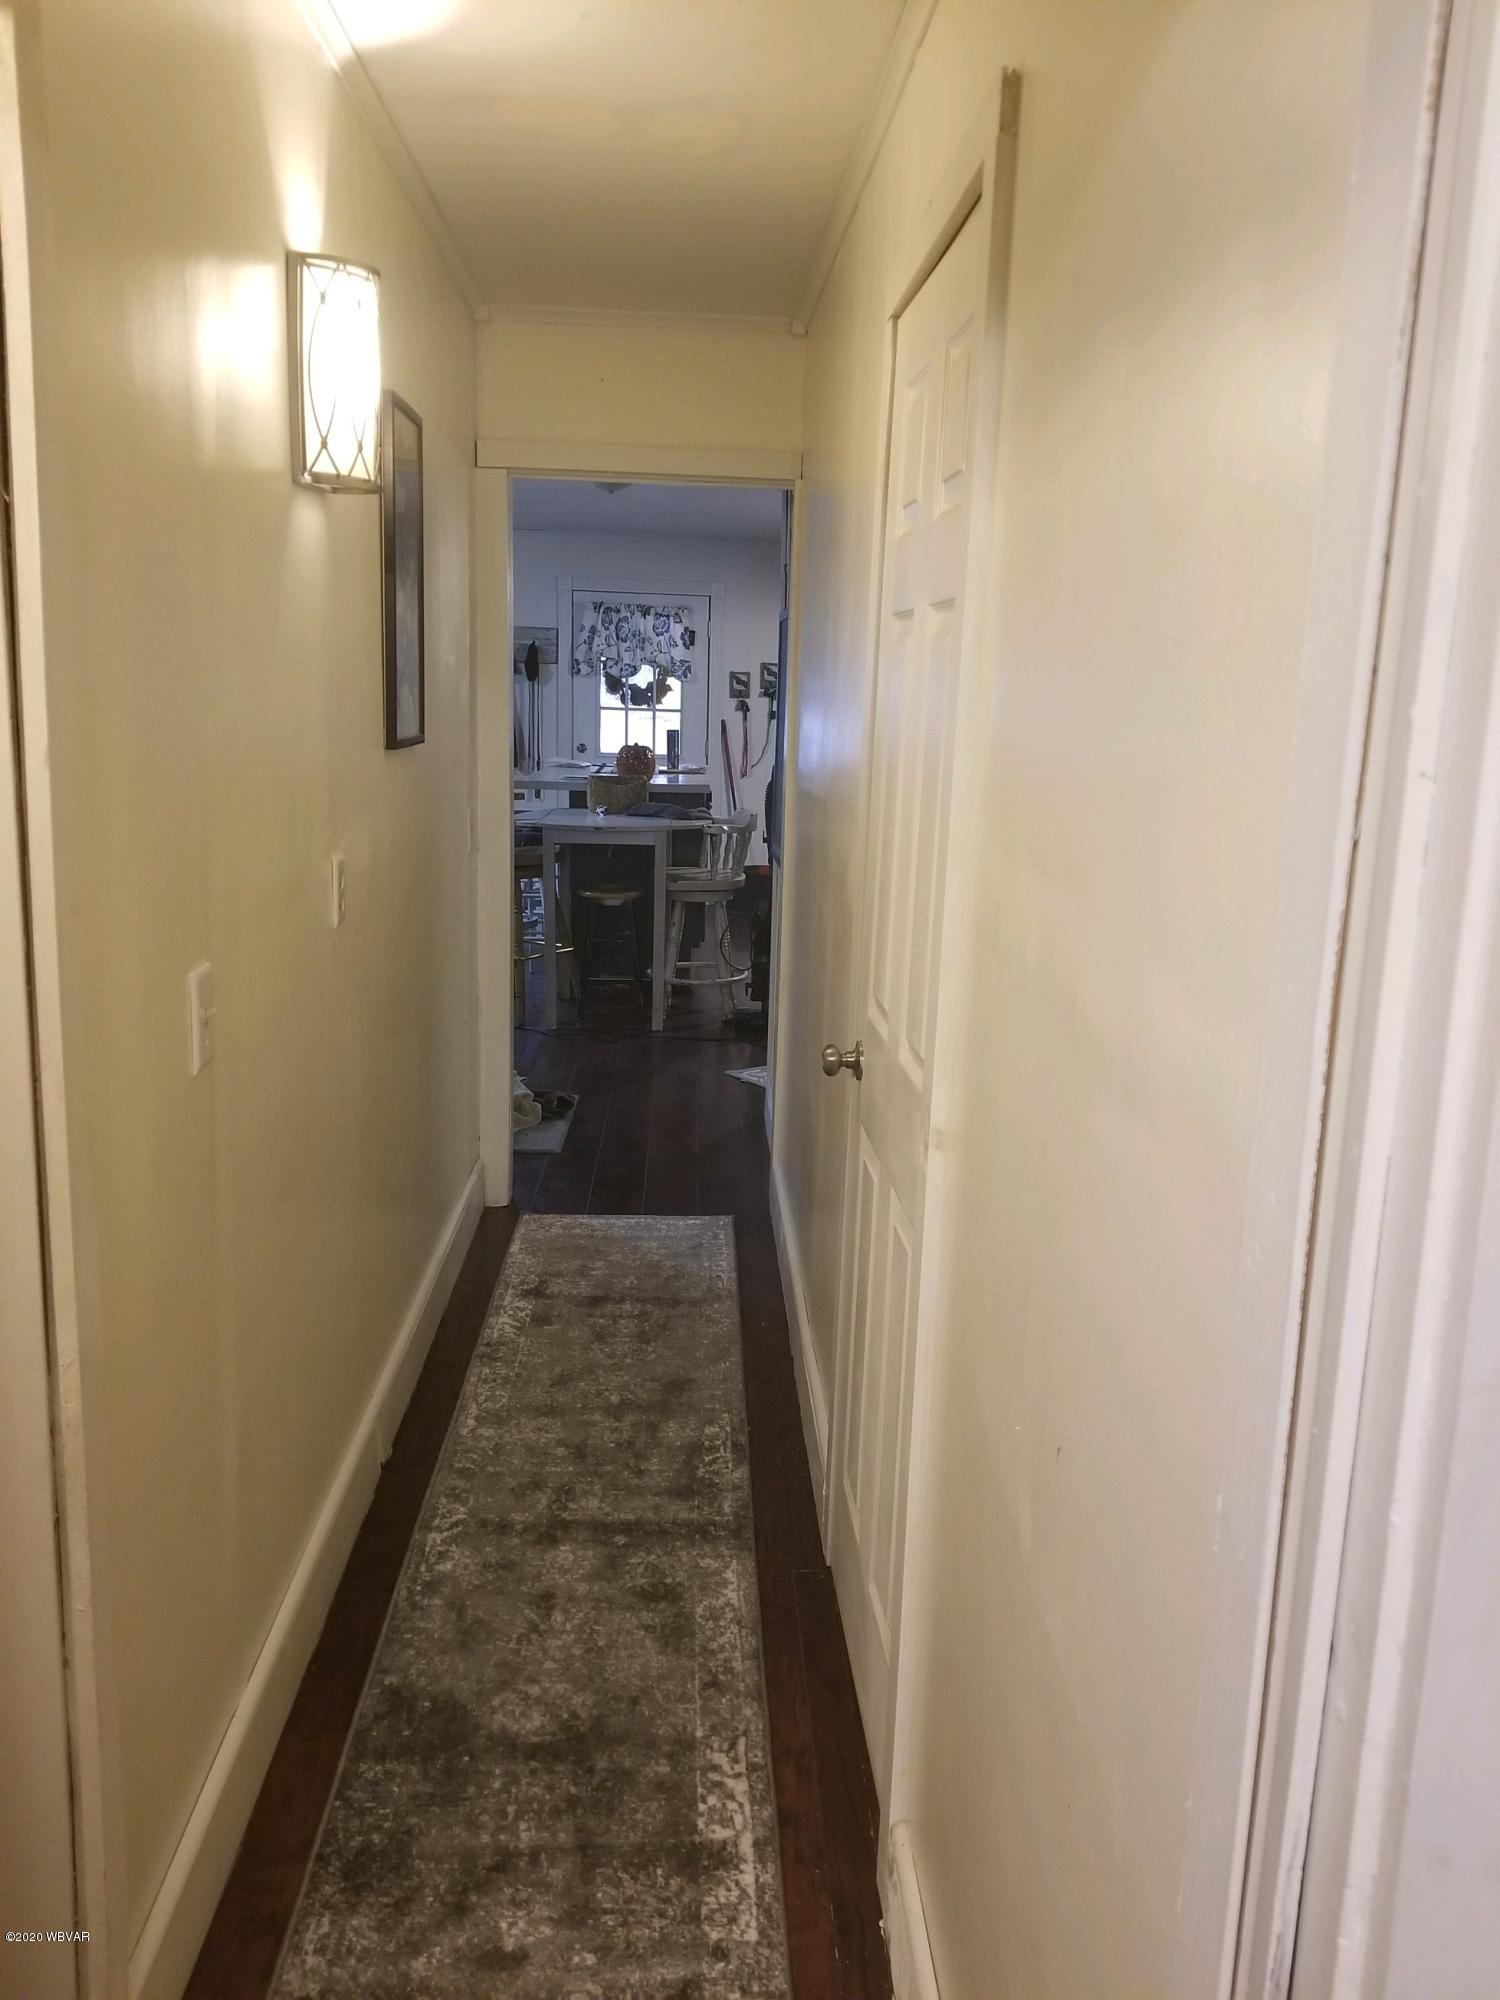 1633 TOM HILL HOLLOW ROAD,Muncy,PA 17756,4 Bedrooms Bedrooms,1 BathroomBathrooms,Residential,TOM HILL HOLLOW,WB-89351